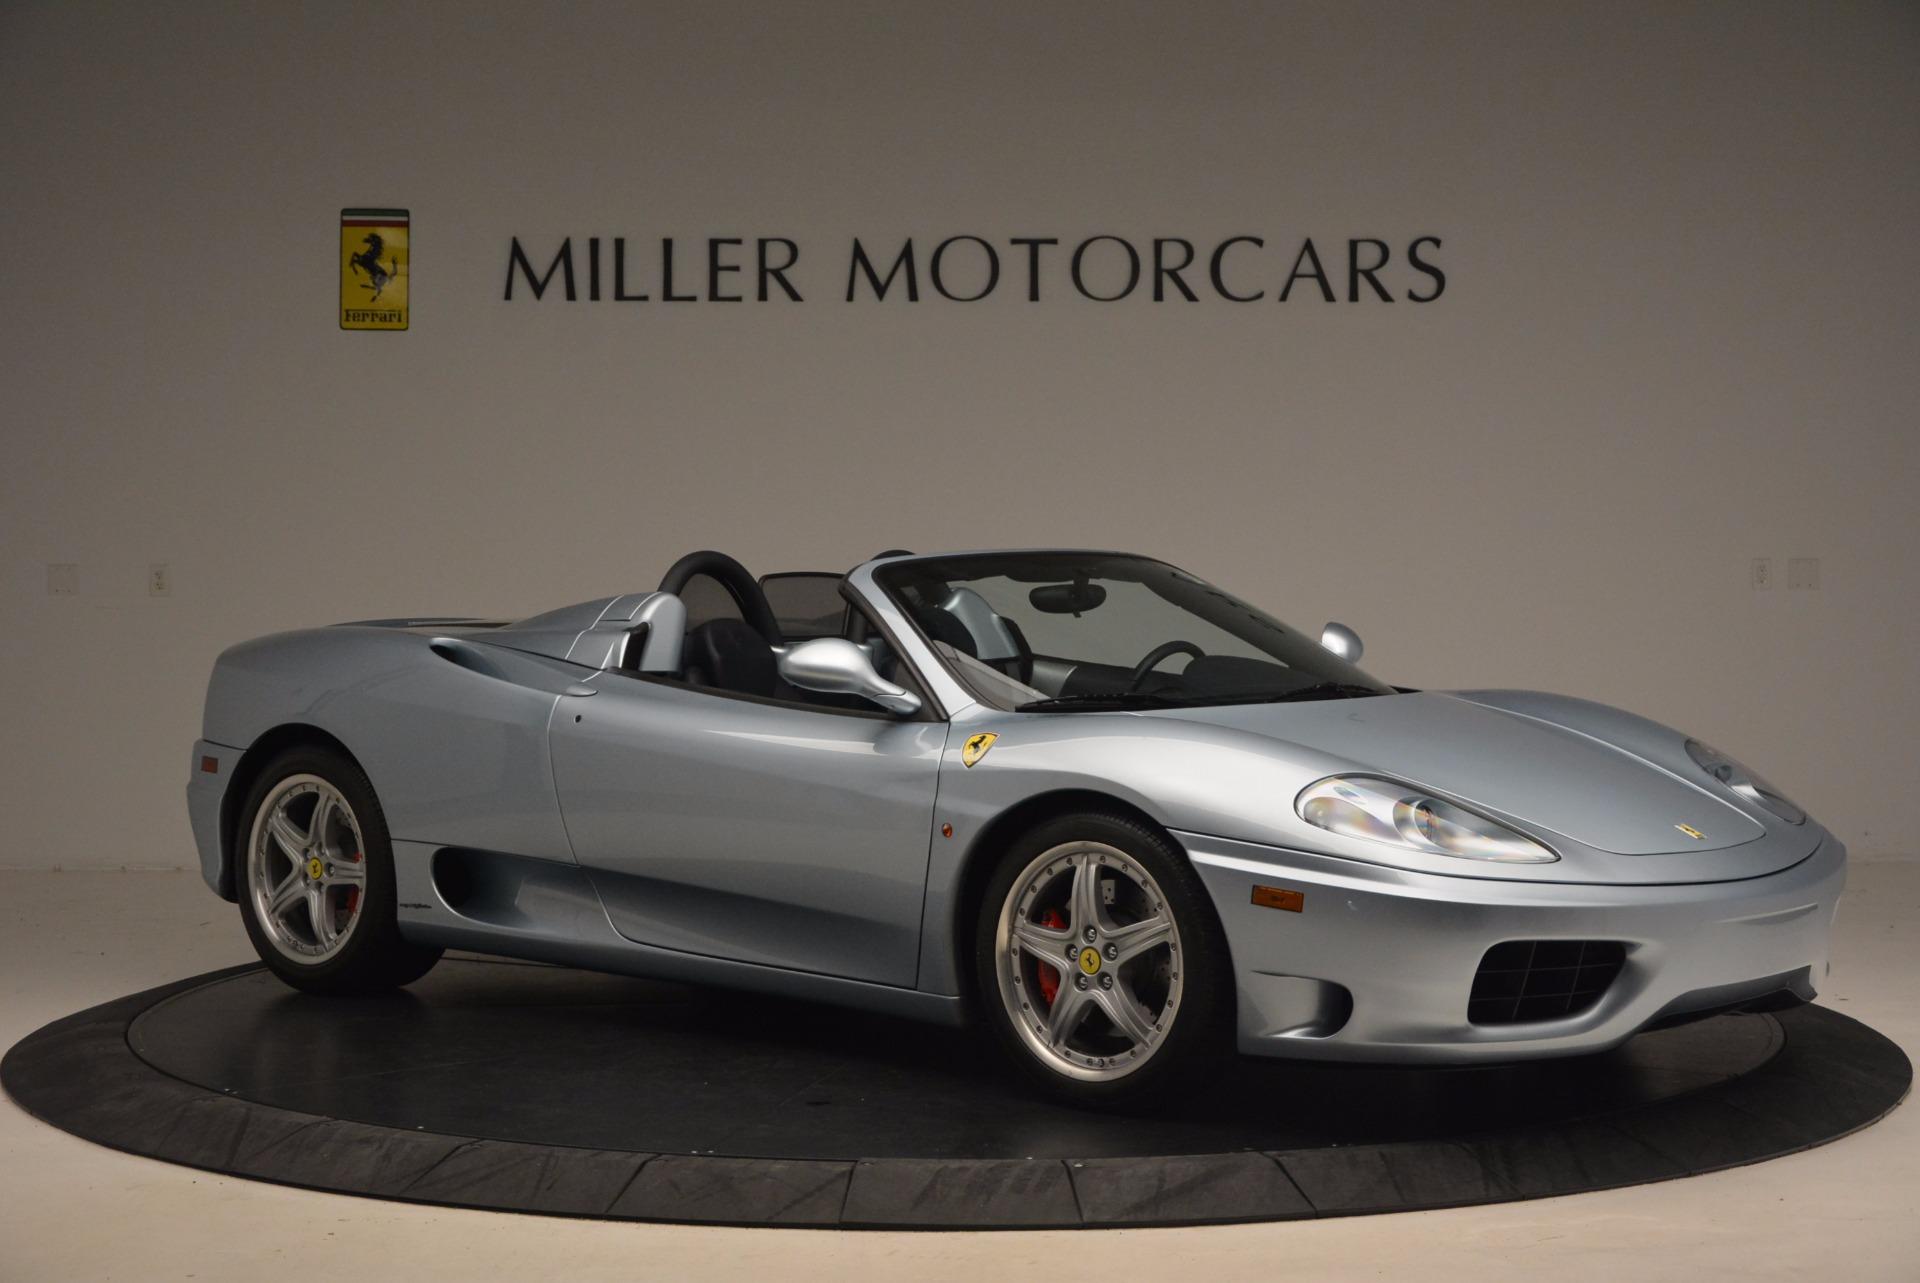 Used 2003 Ferrari 360 Spider 6-Speed Manual For Sale In Westport, CT 1445_p10